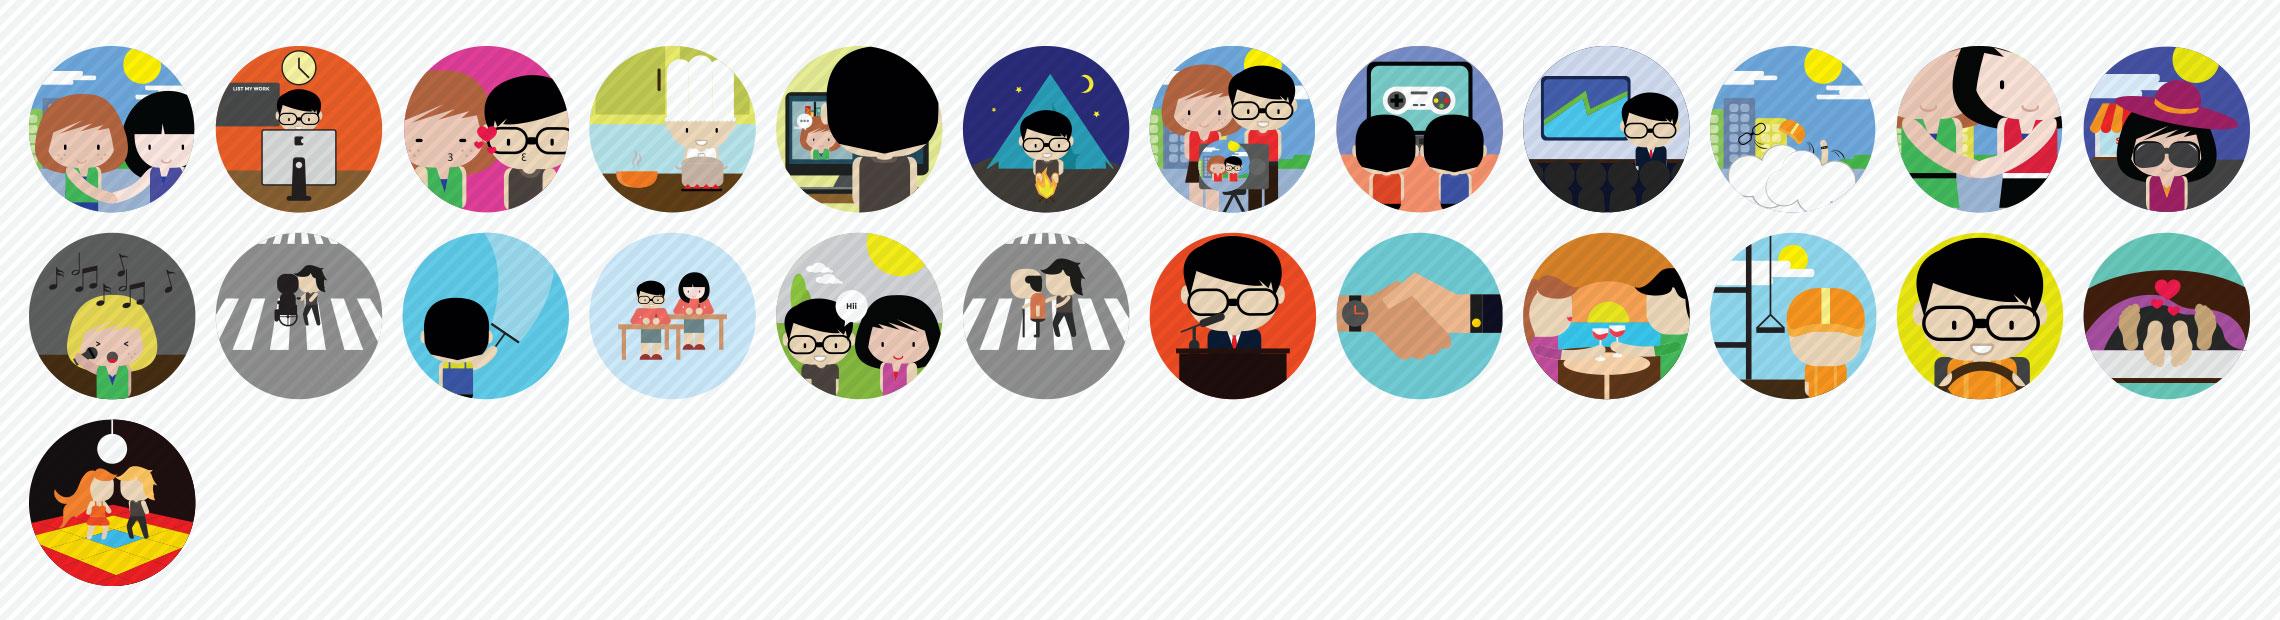 Social-Interactions-Flat-Icons